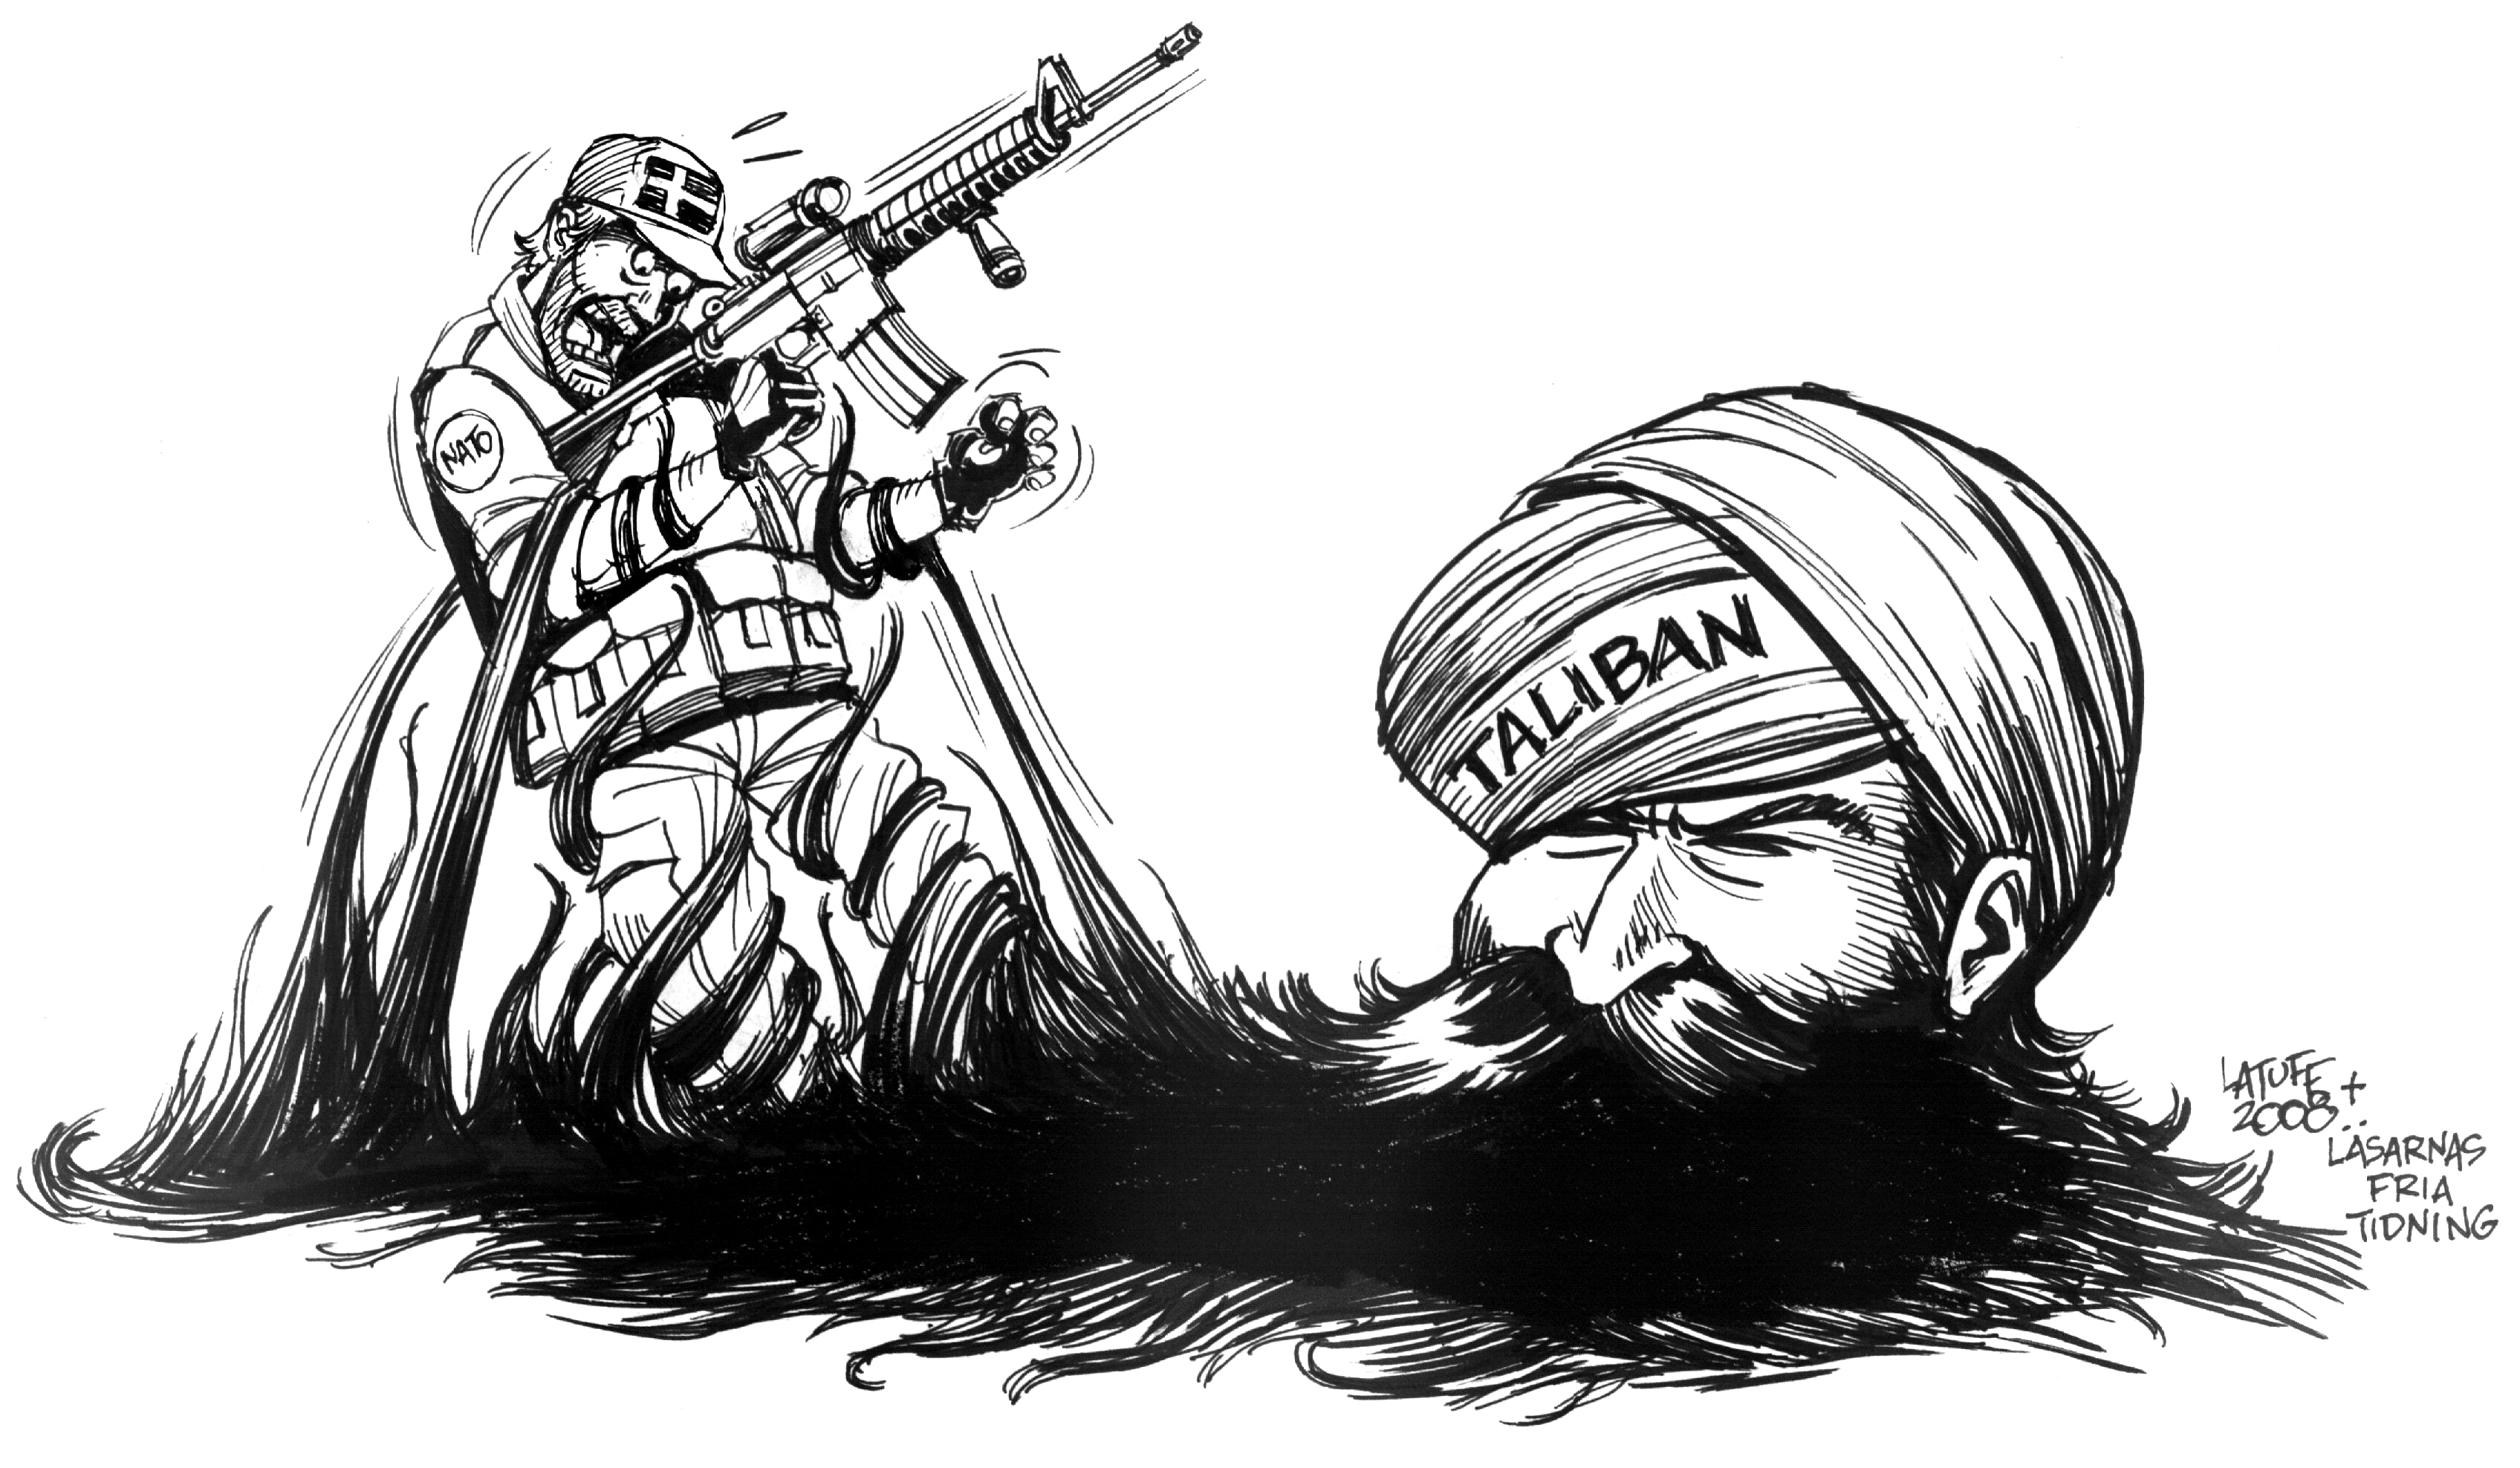 File:Taliban.jpg - Wikimedia Commons